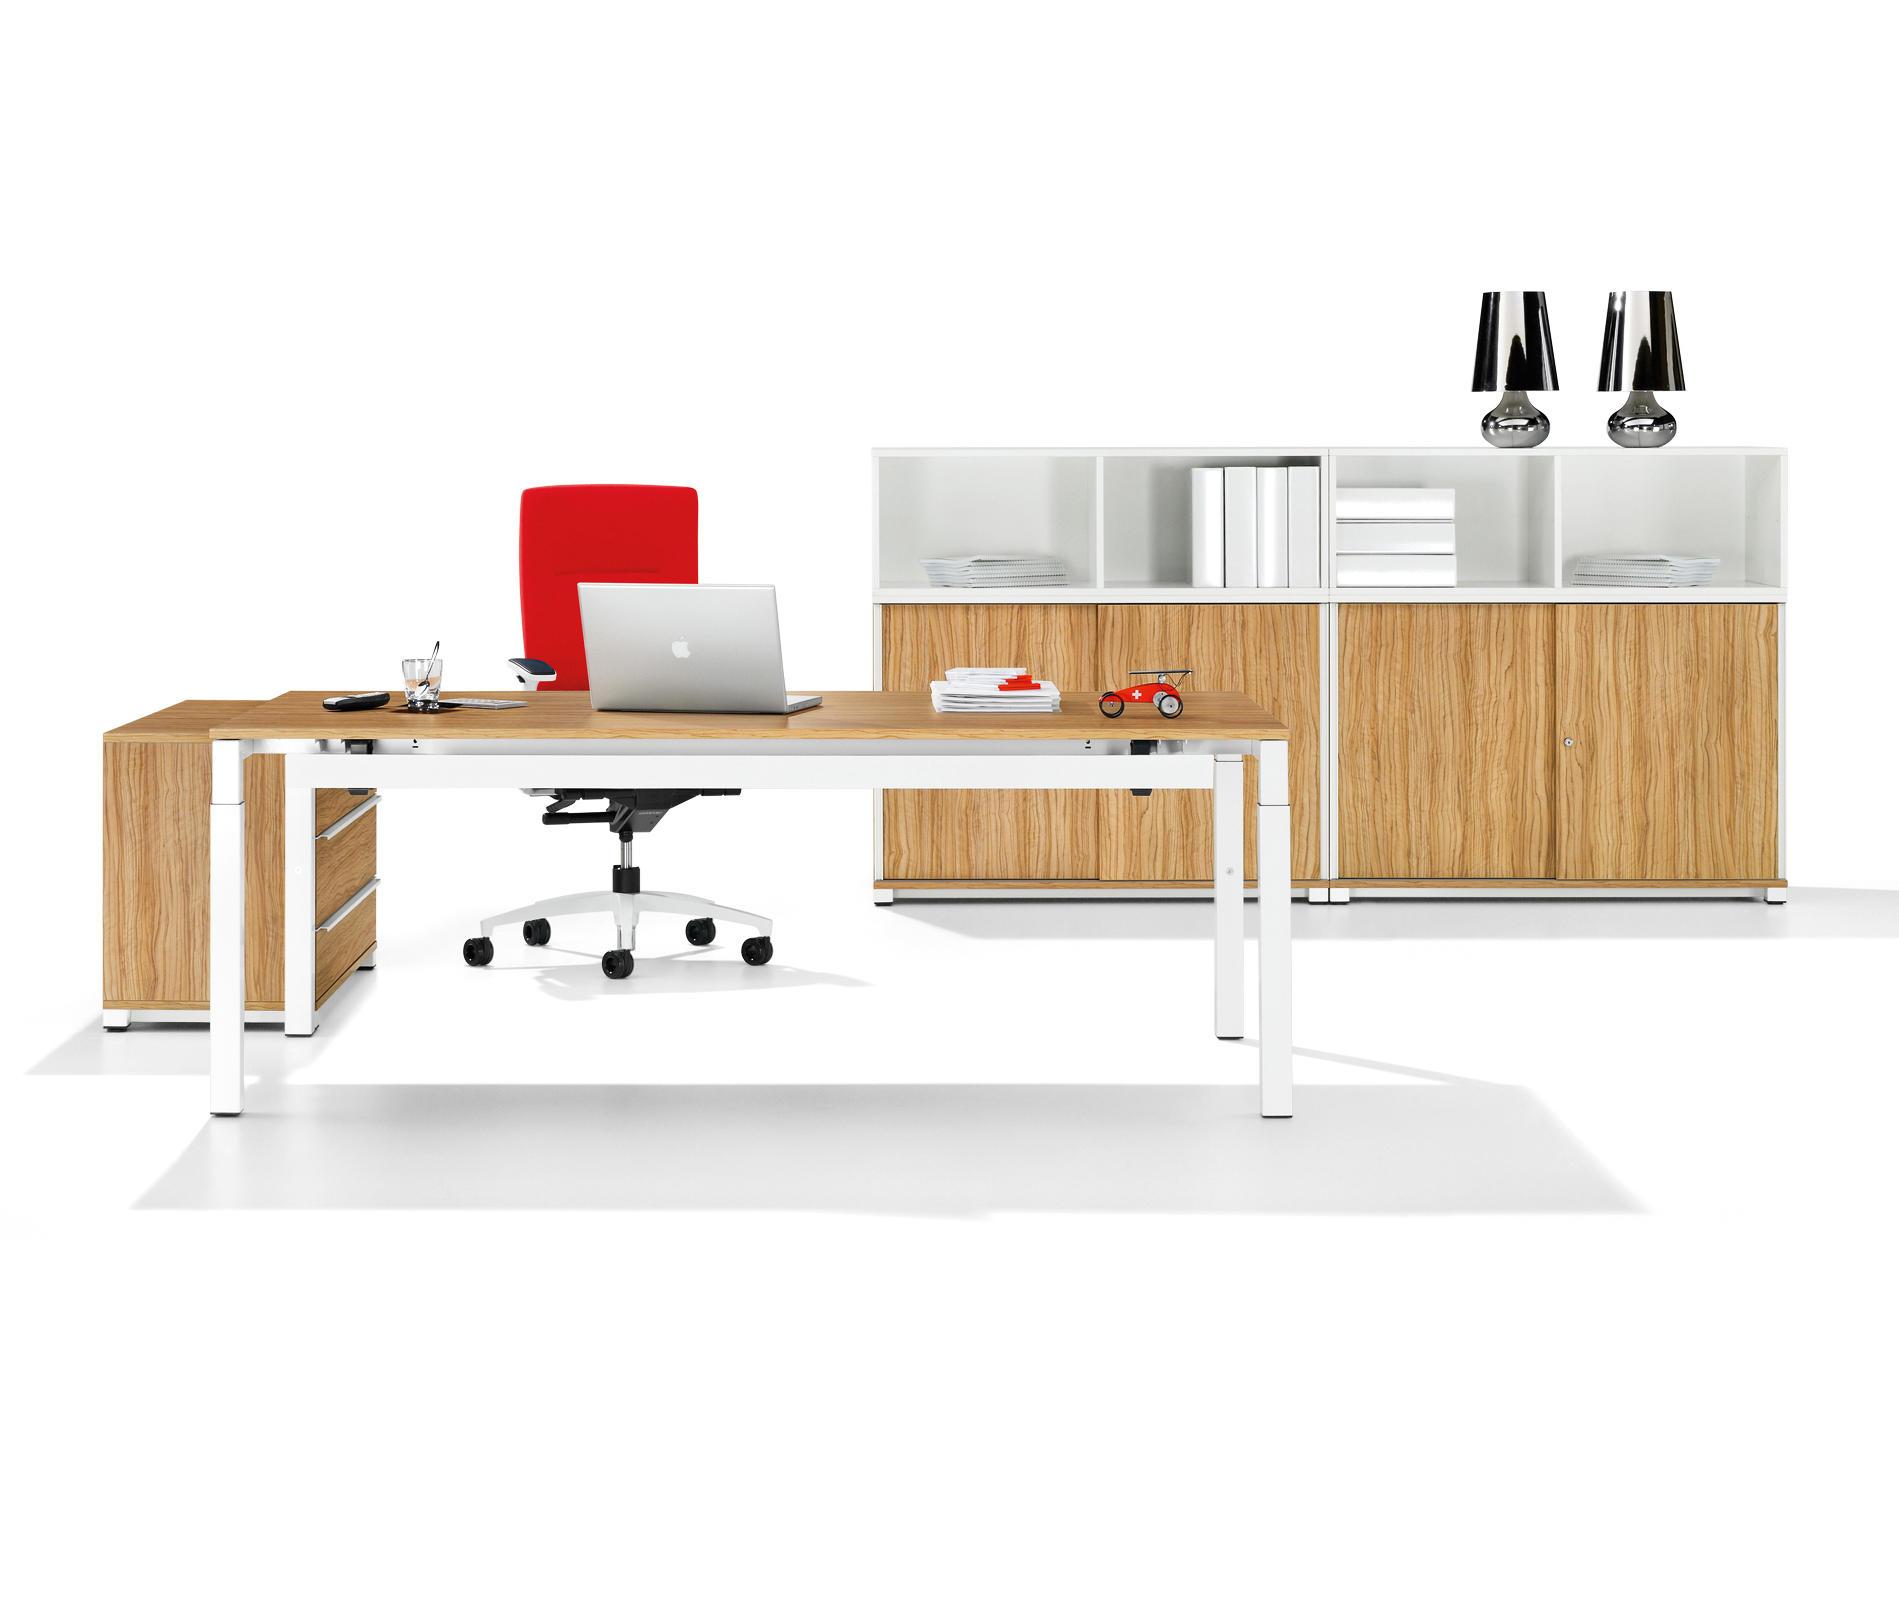 WINEA ECO - Individual desks from WINI Büromöbel | Architonic